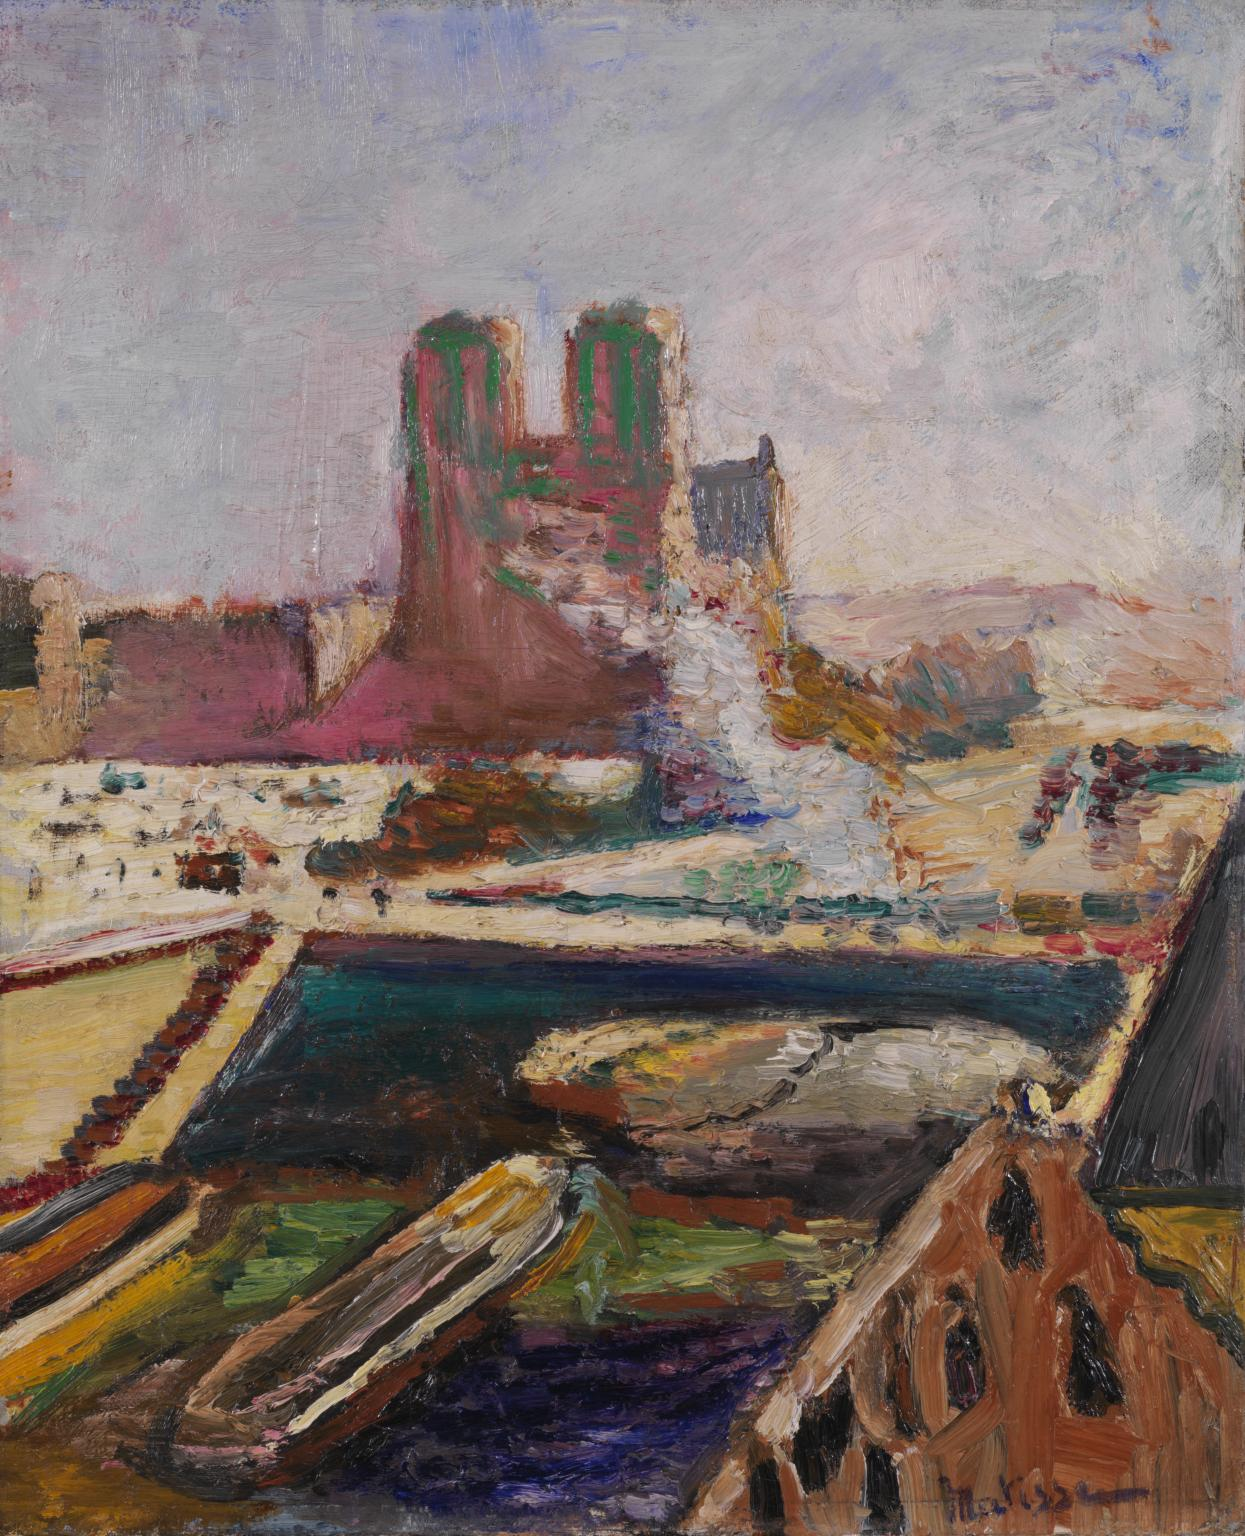 Notre-Dame c.1900 by Henri Matisse 1869-1954